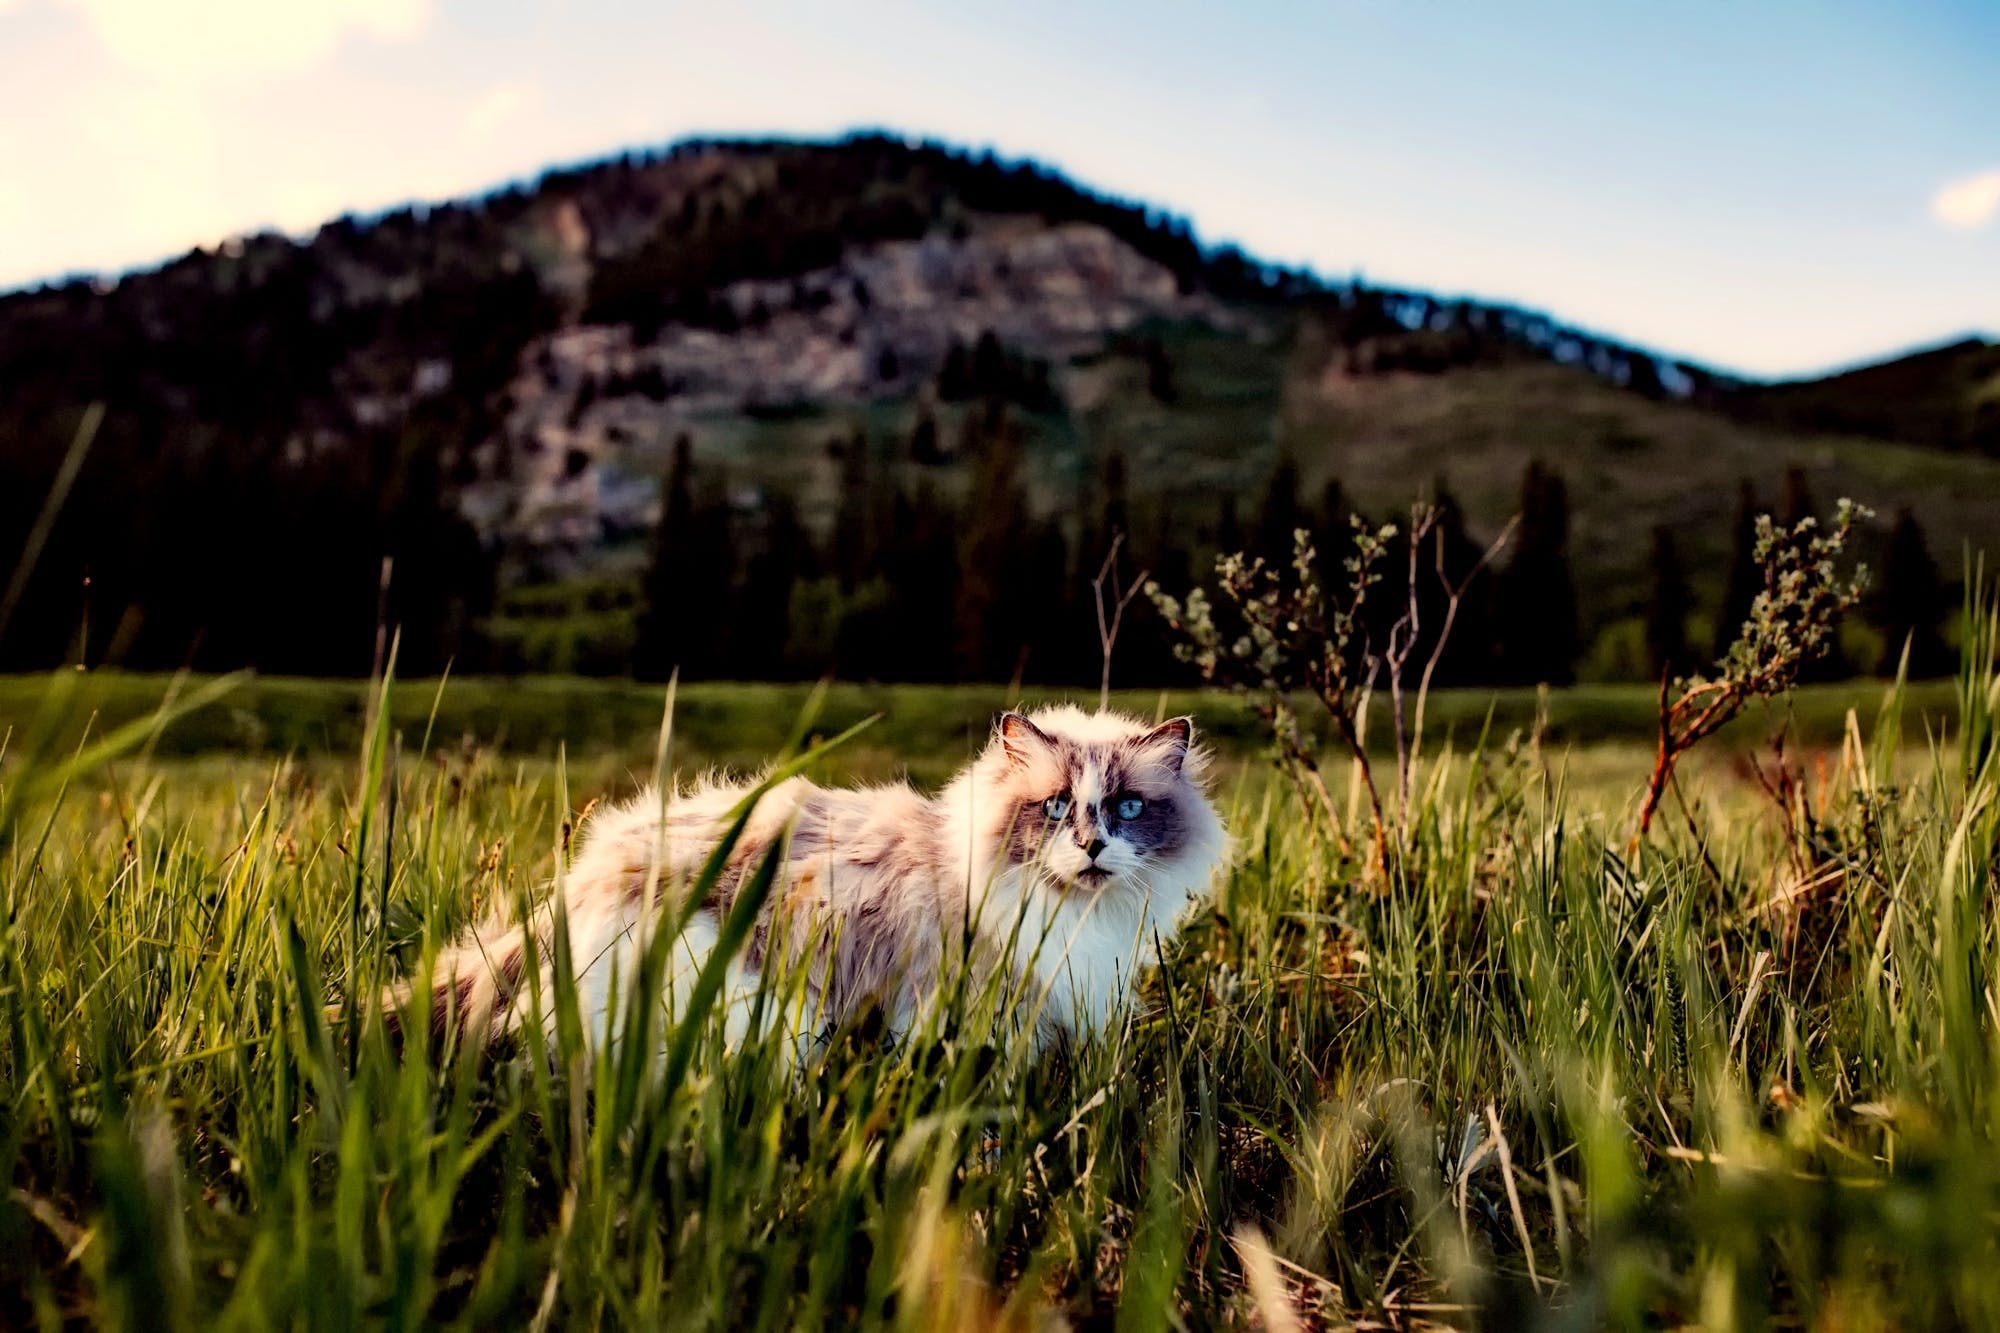 White Cat on Grass Field